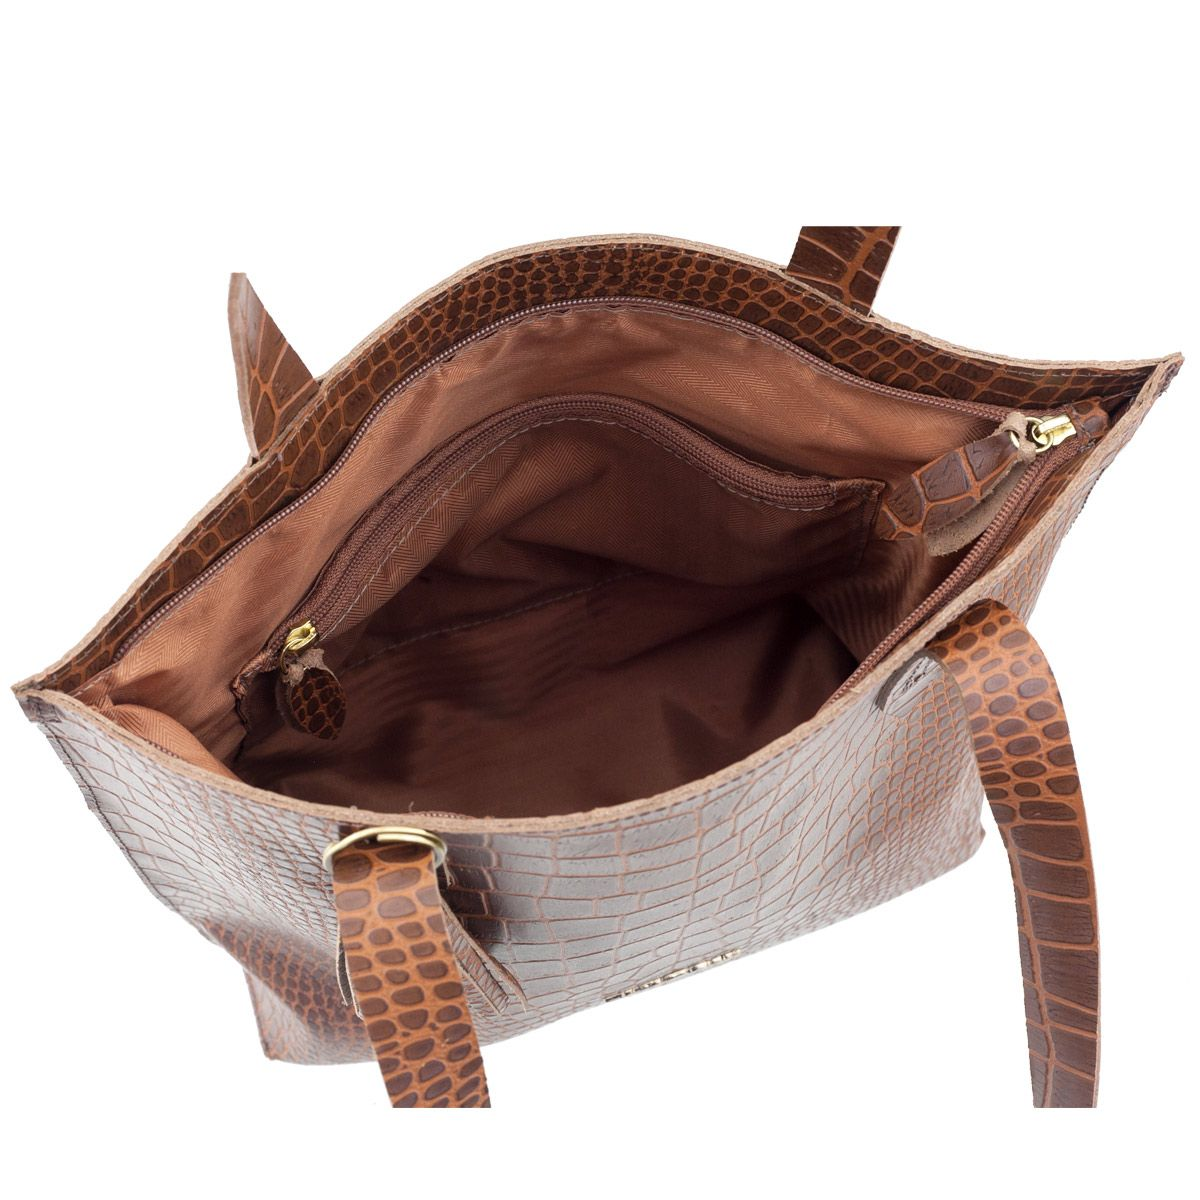 Bolsa Sacola de Couro Inverno Chocolate